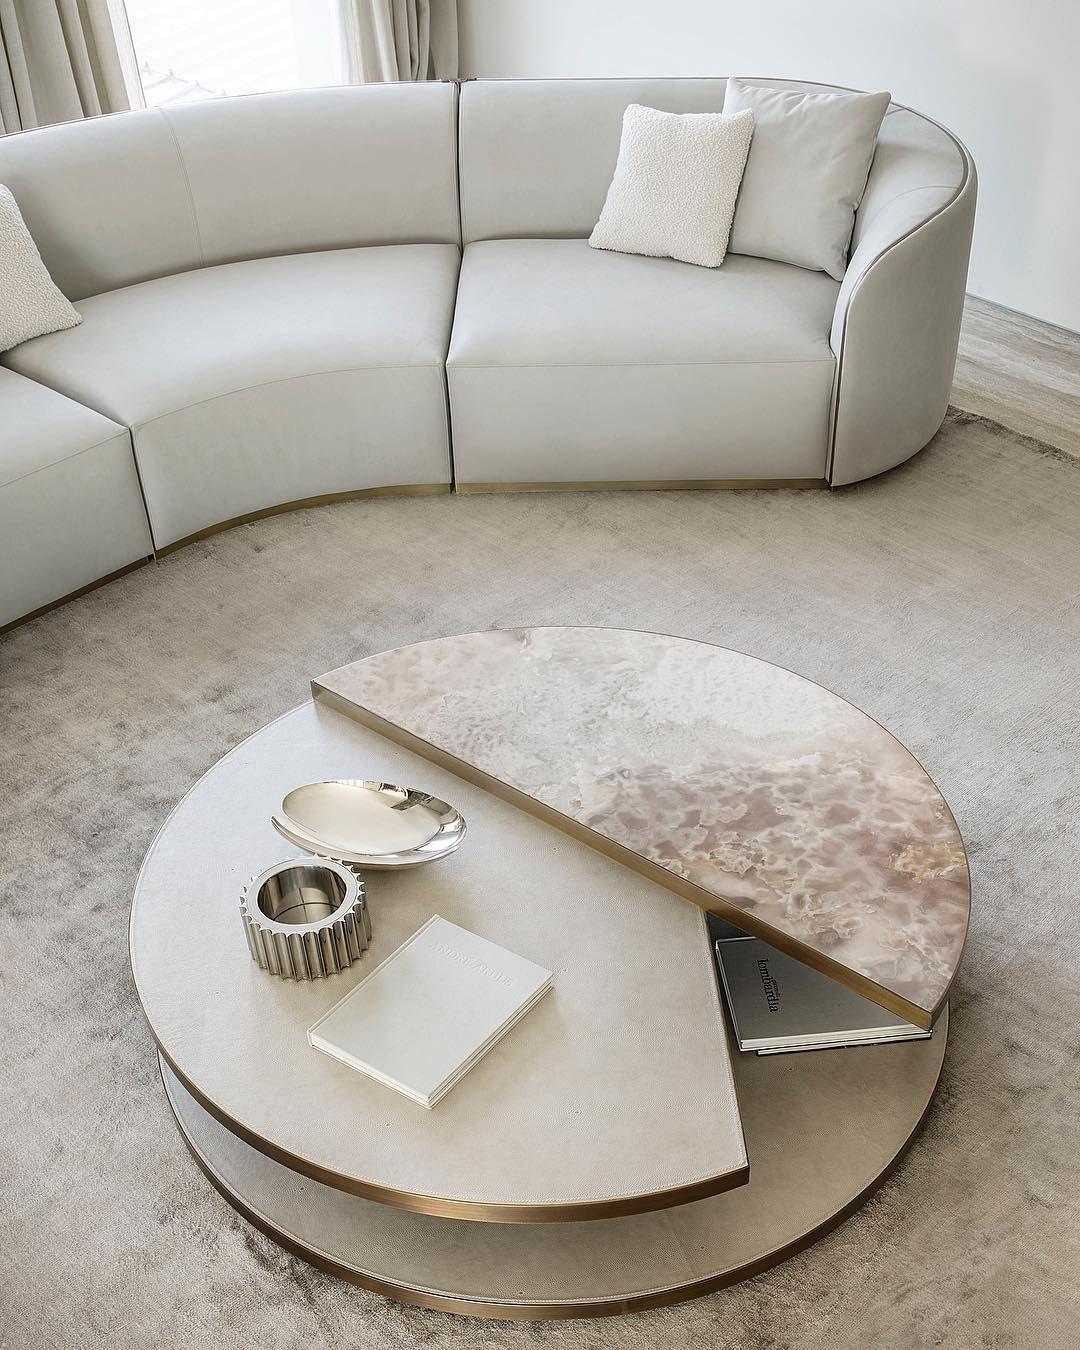 Italian Luxury Furniture Designer Furniture Singapore Da Vinci Lifestyle Coffee Table Design Contemporary Furniture Design Living Room Center [ 1350 x 1080 Pixel ]